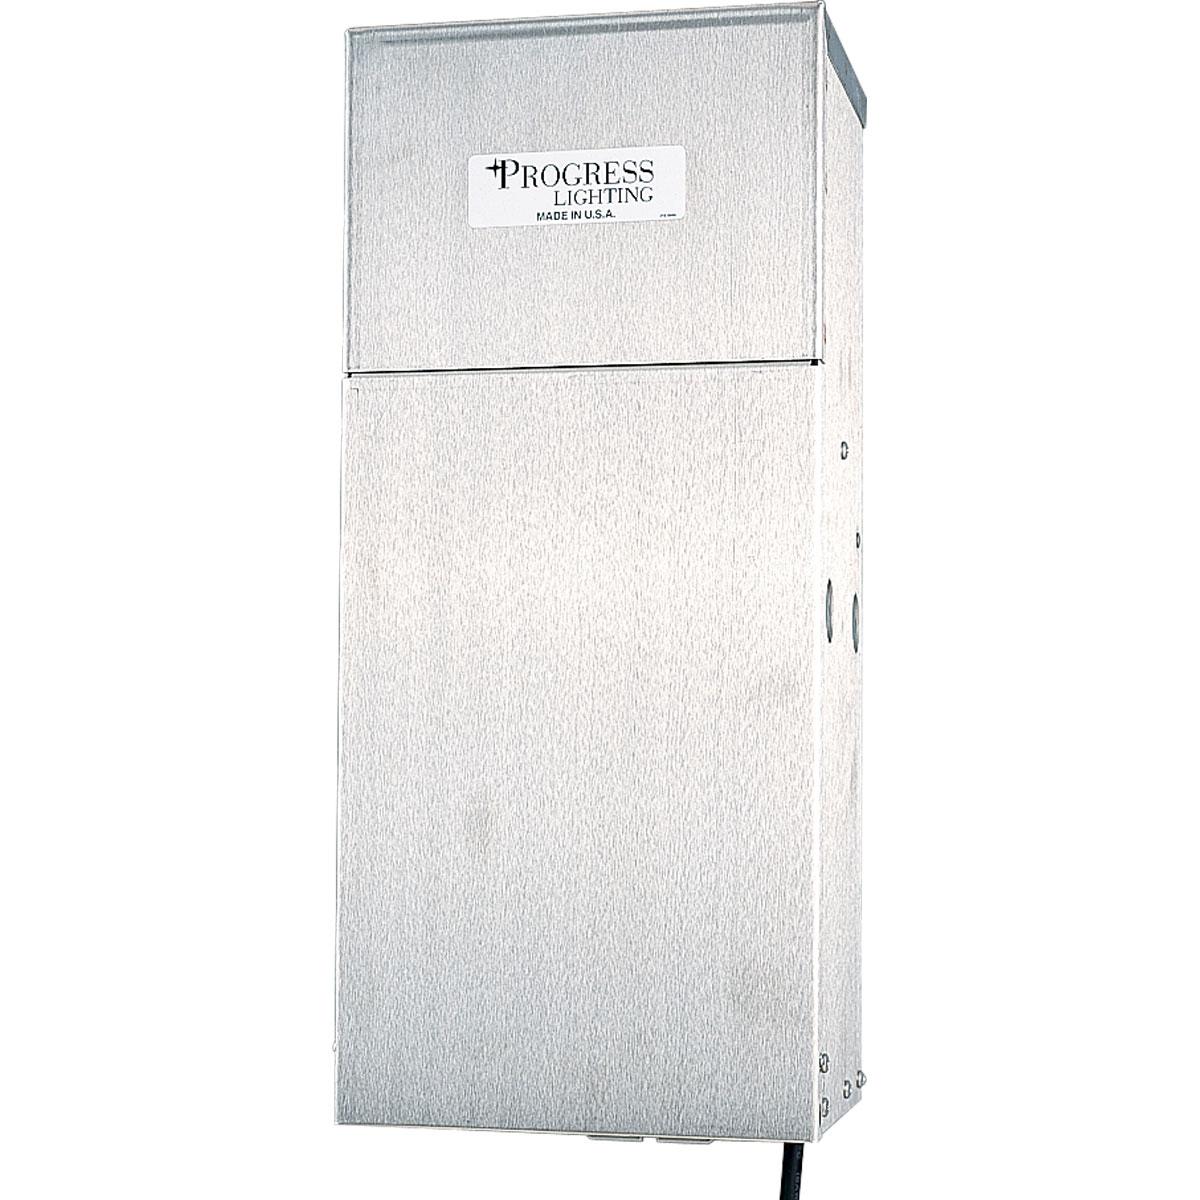 Progress Lighting® P8520-01 Commodity/Utilitarian Electronic Landscape Transformer, 120 VAC Input, 12 VAC Output, 600 W